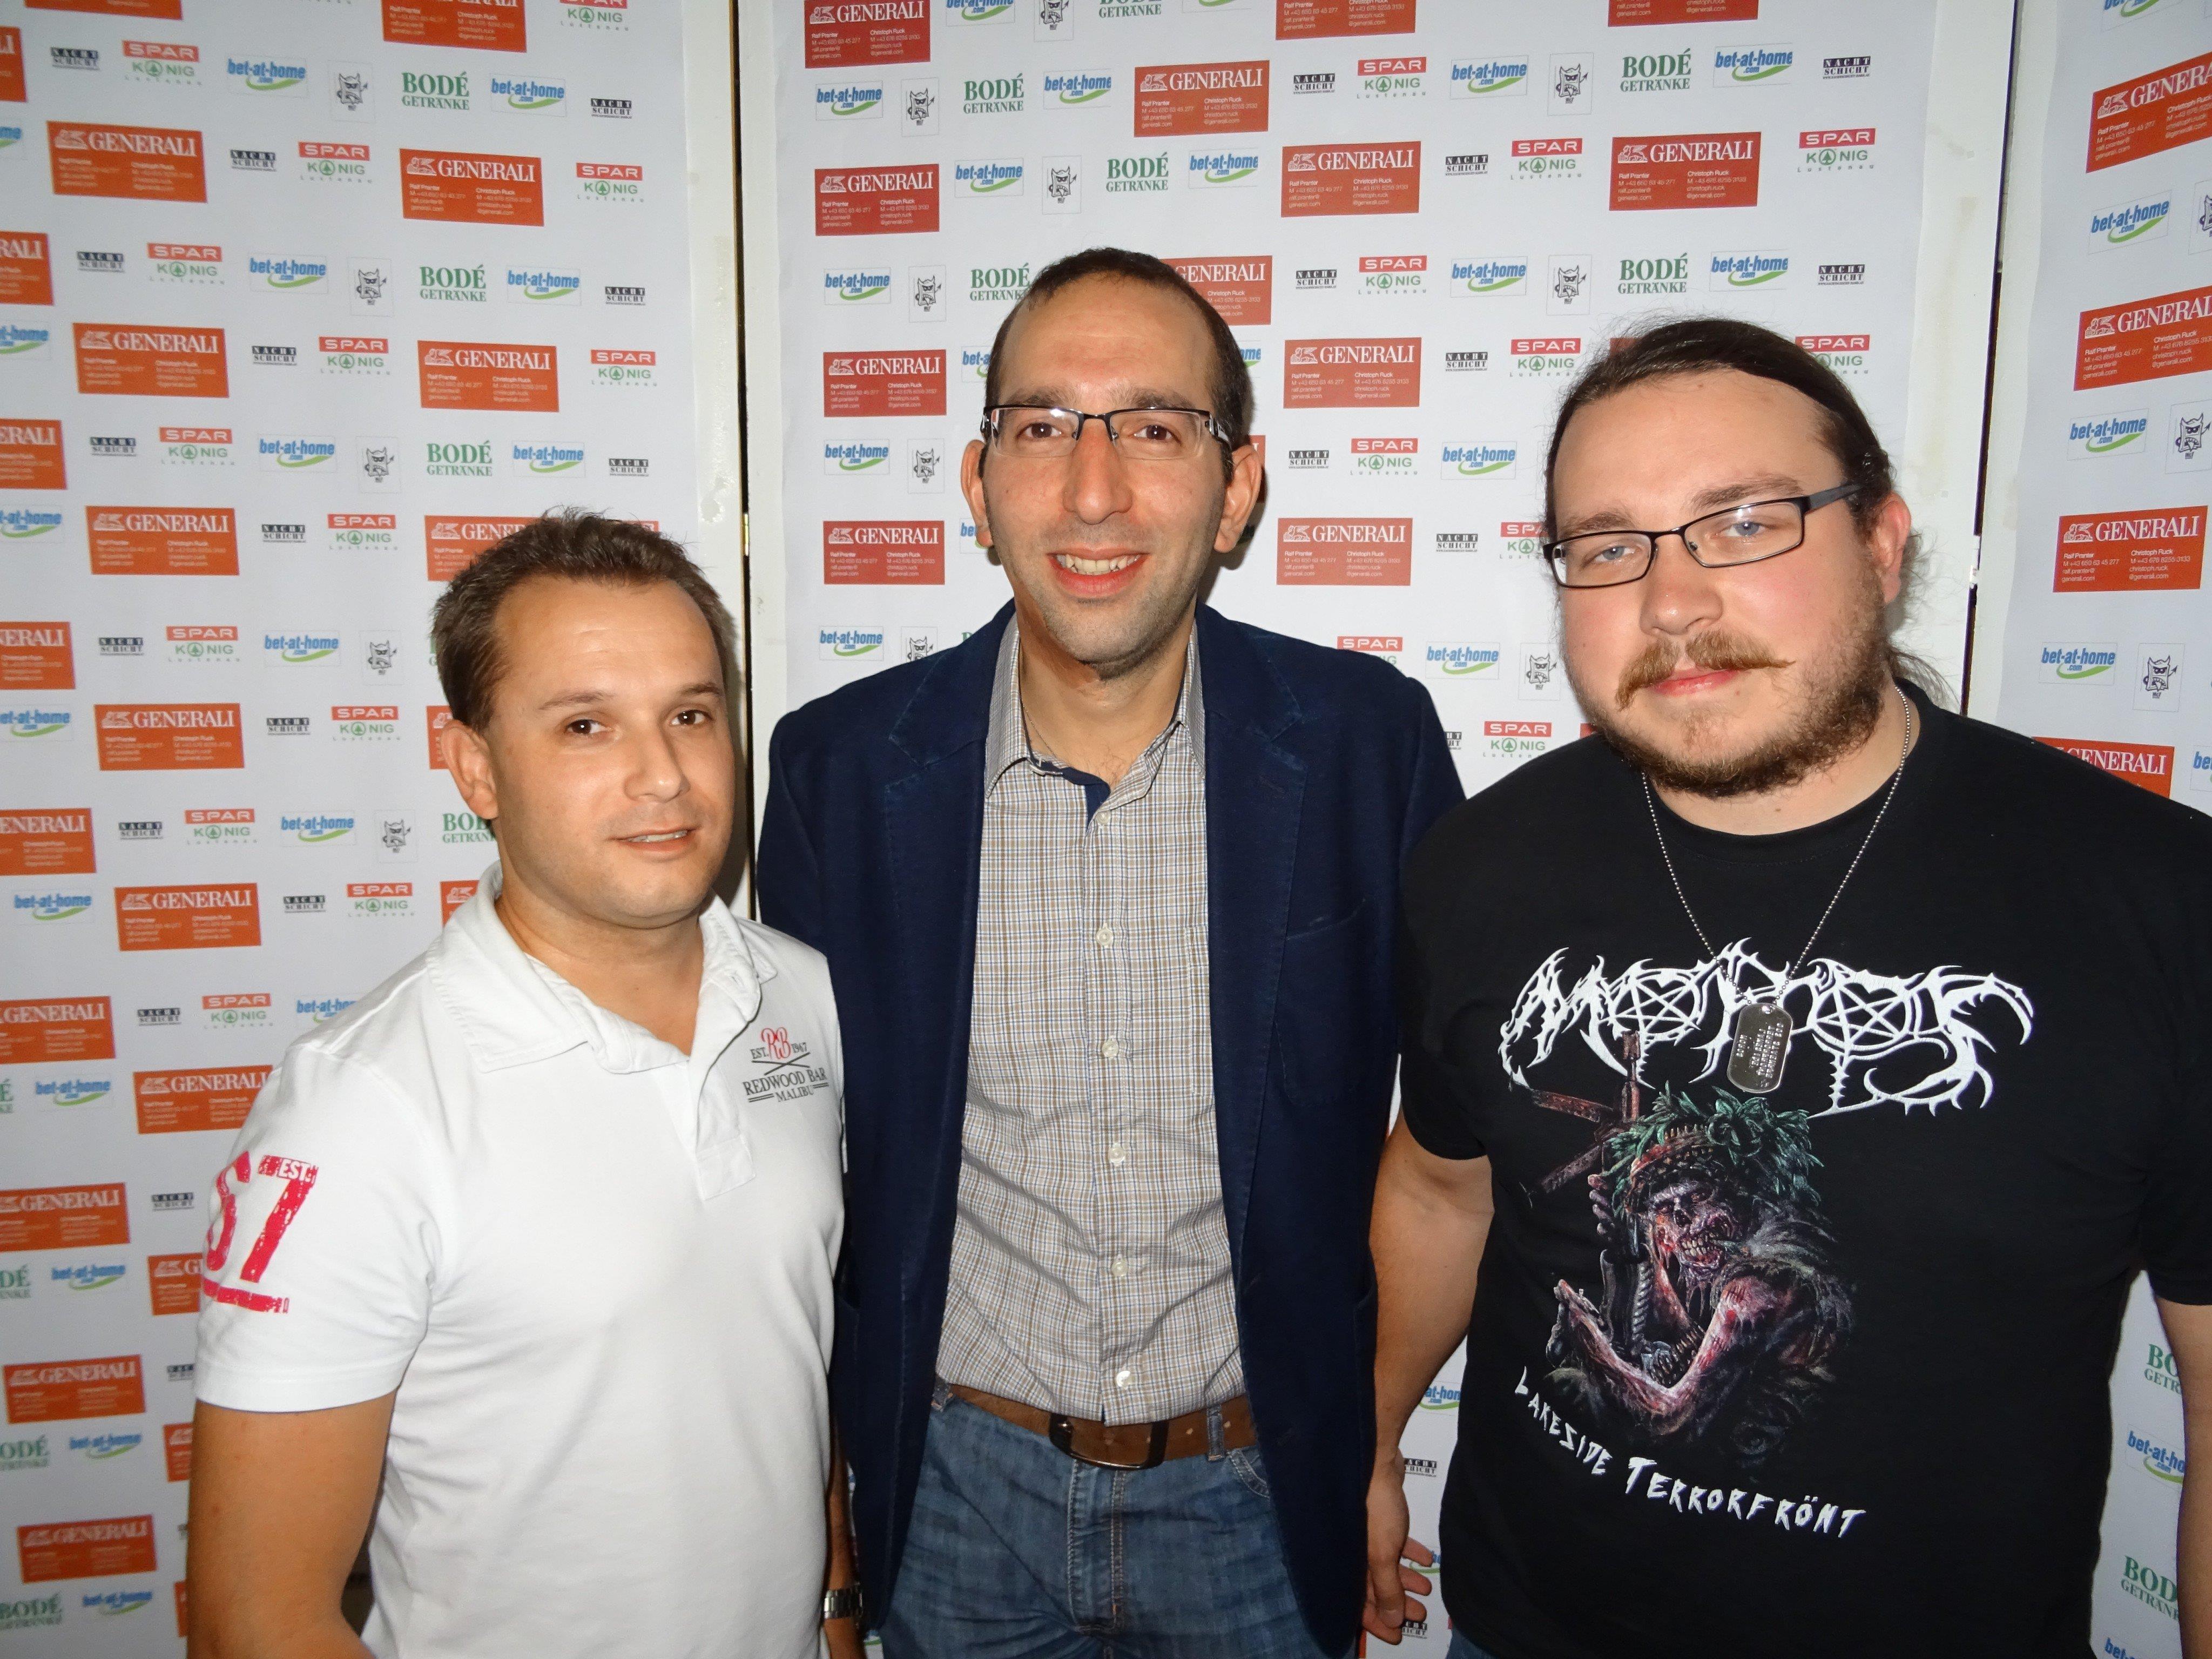 Das Siegerfoto (v.l.n.r.): Thomas Metzler, Saban Hacioglu, Christian Stampfer